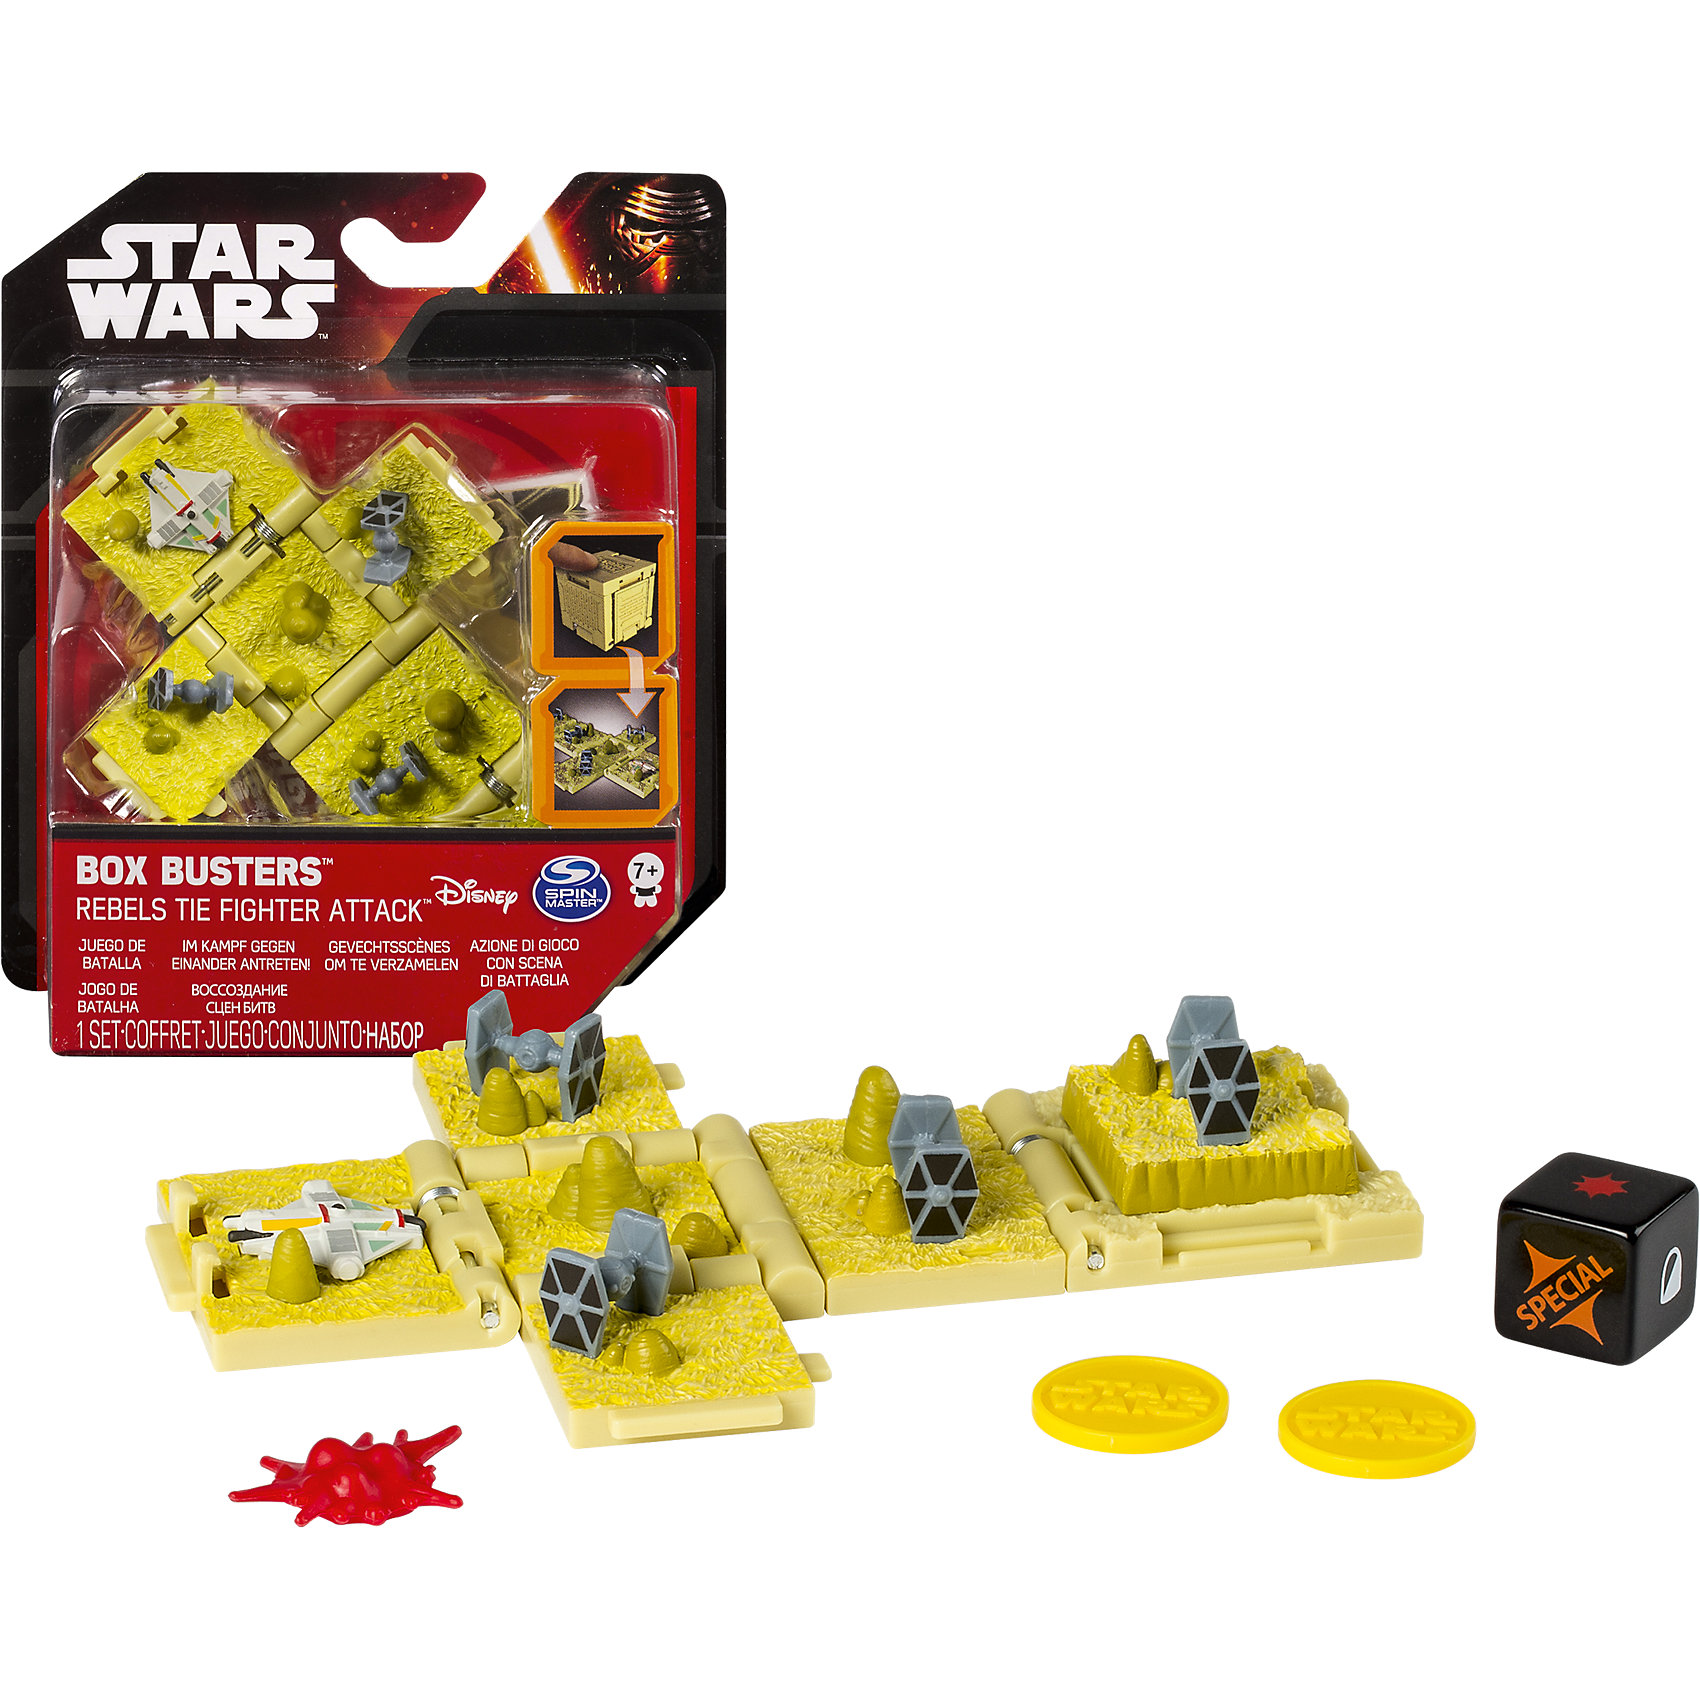 Spin Master Боевые кубики, Звездные войны spin master боевые кубики звездные войны tusken raider attack